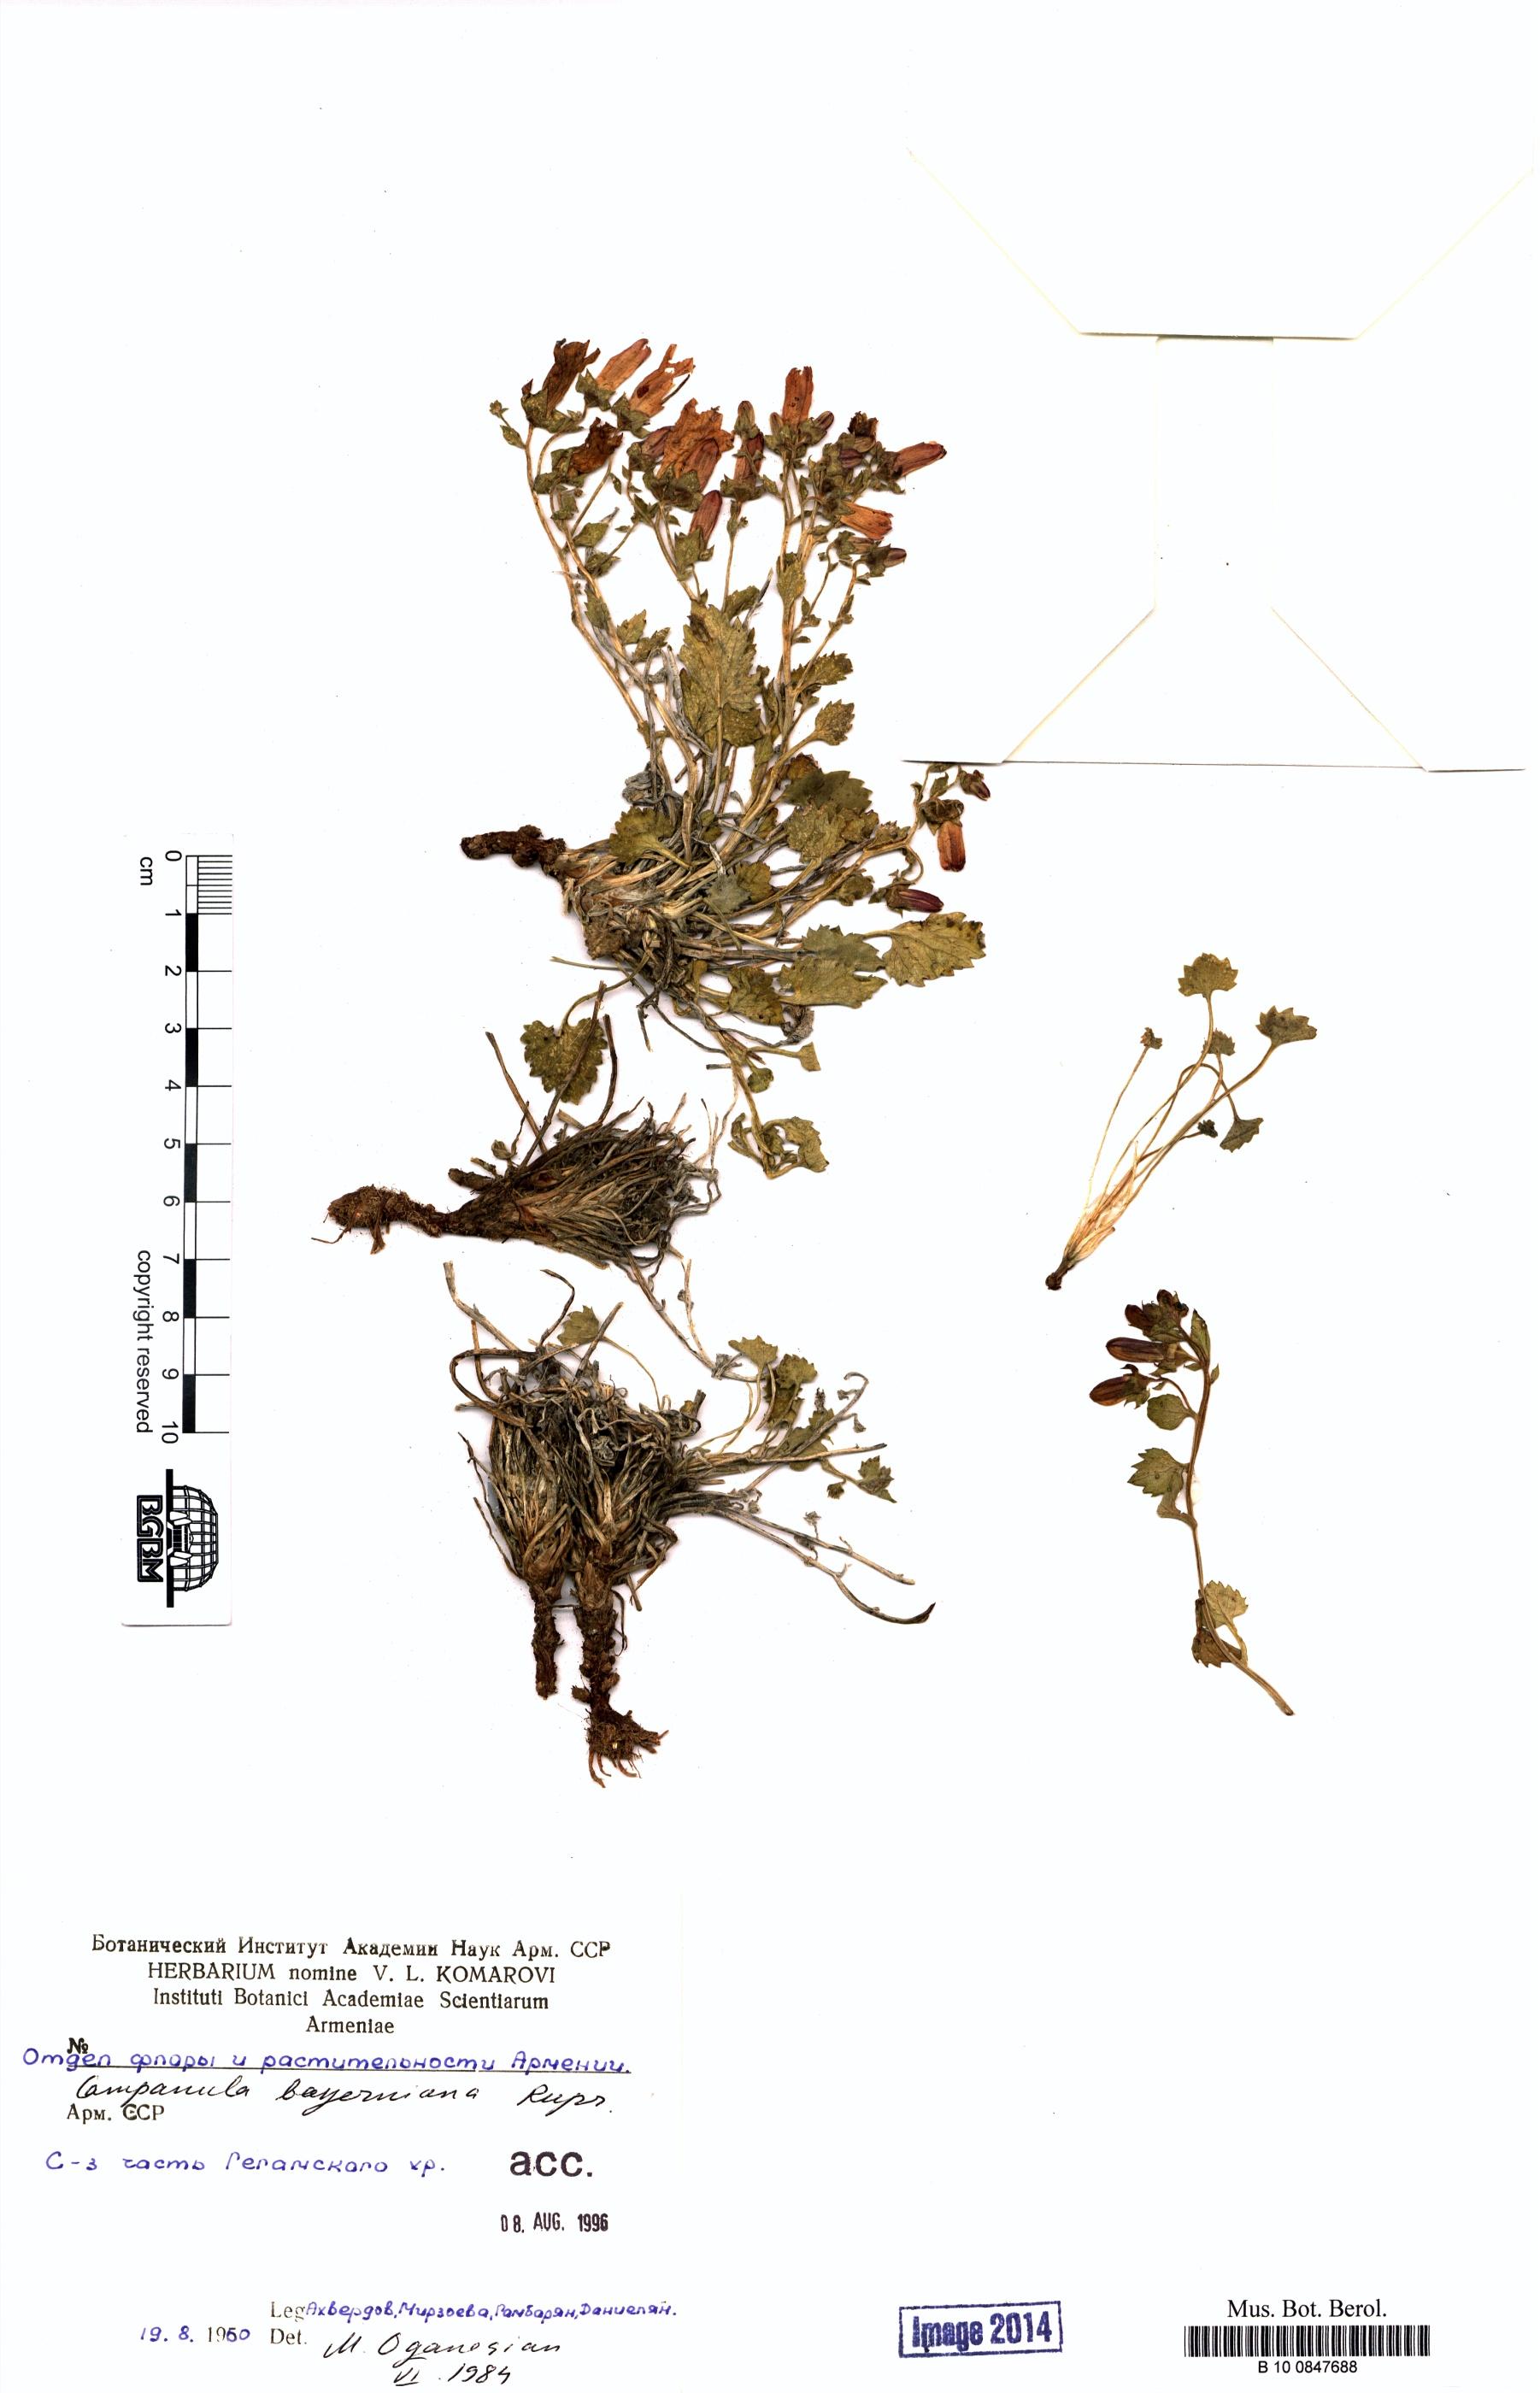 http://ww2.bgbm.org/herbarium/images/B/10/08/47/68/B_10_0847688.jpg